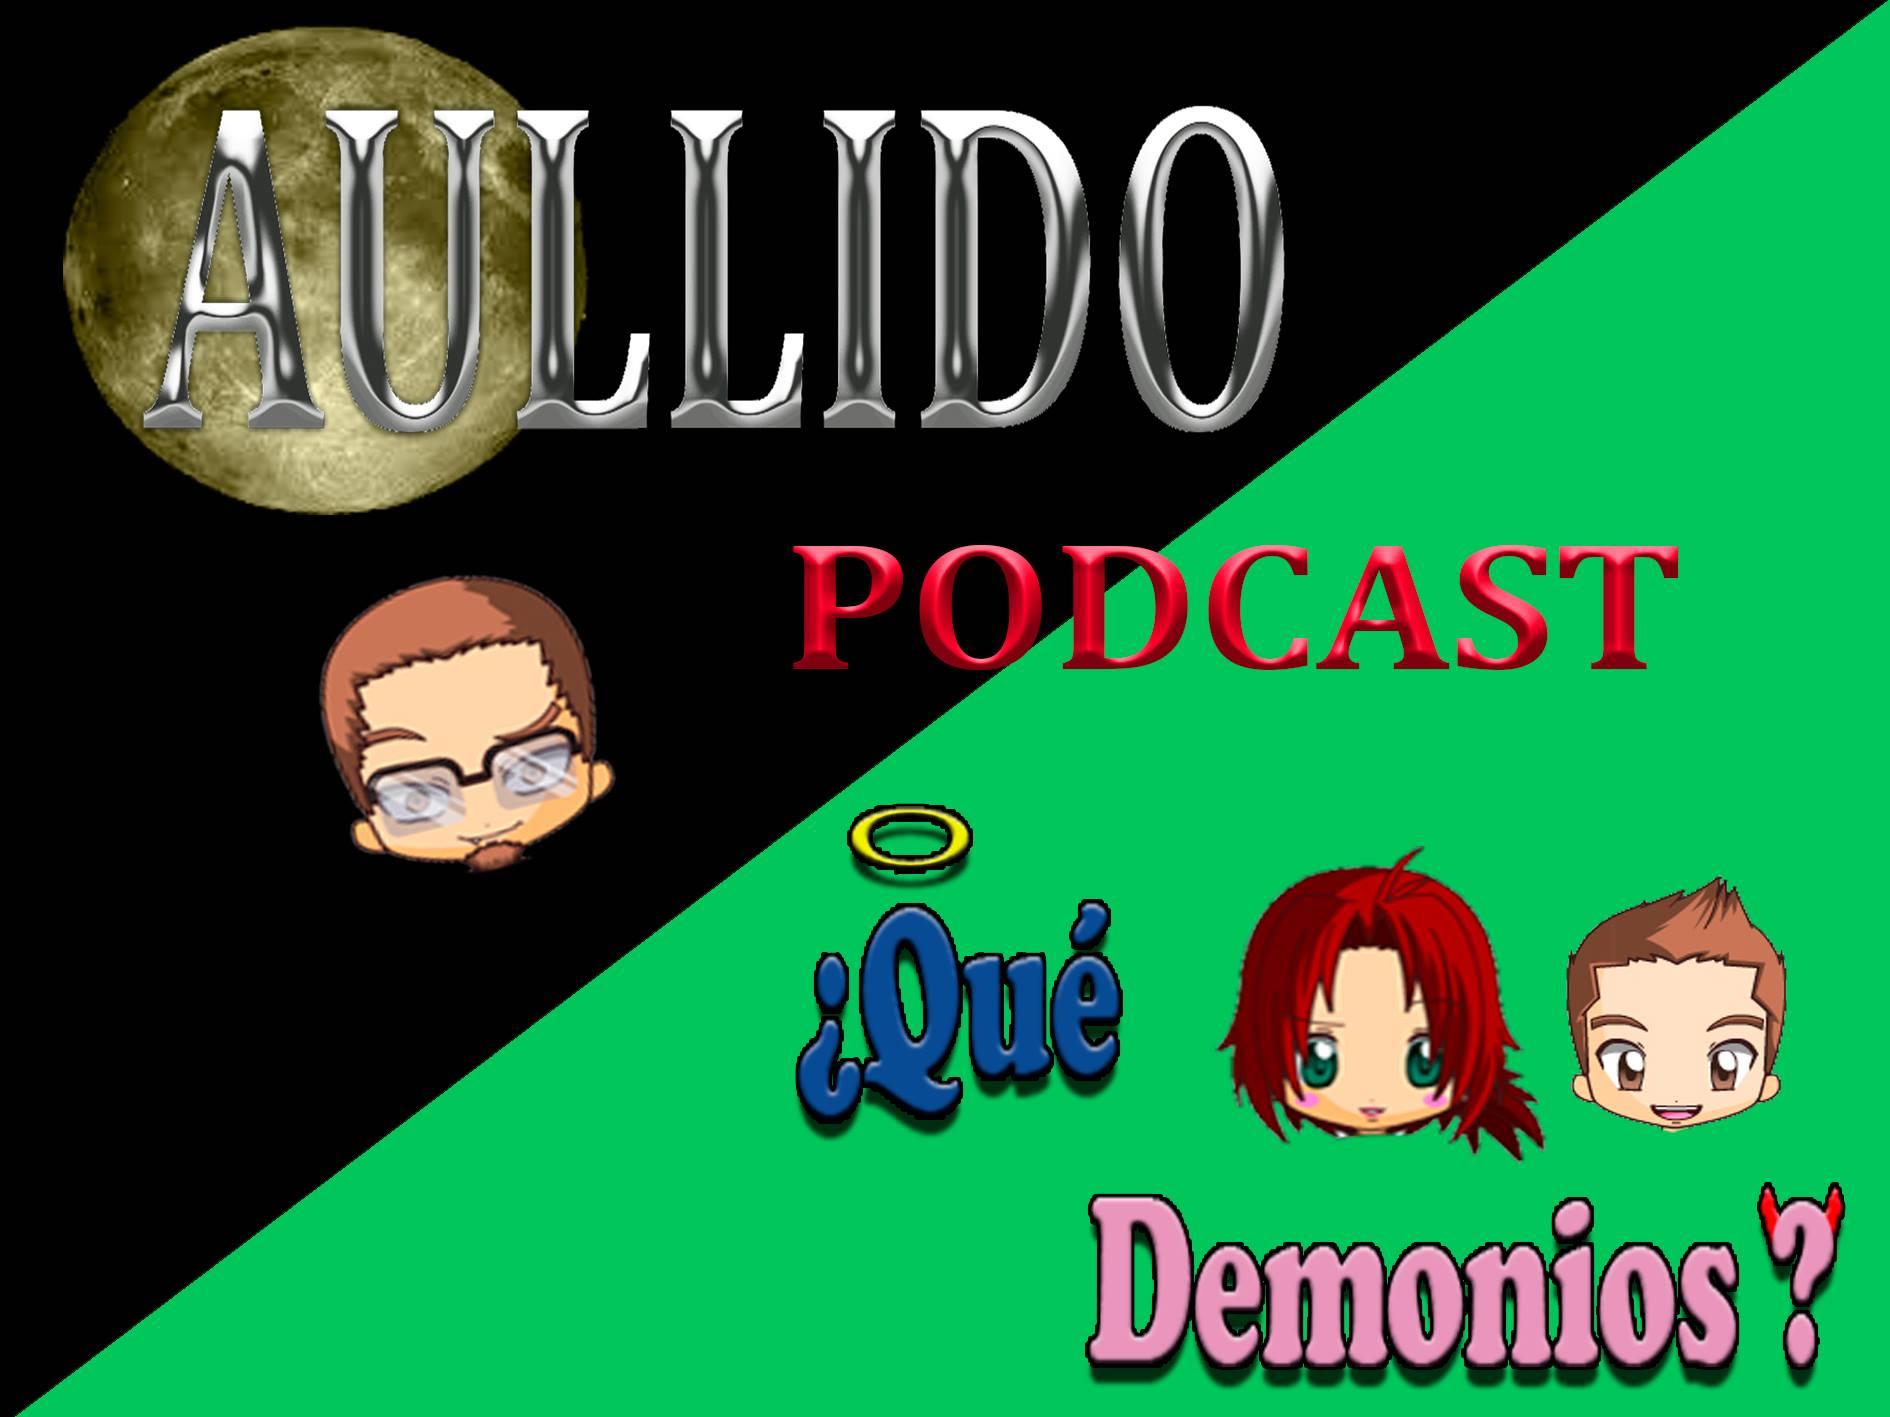 ¿Qué Demonios? Podcast